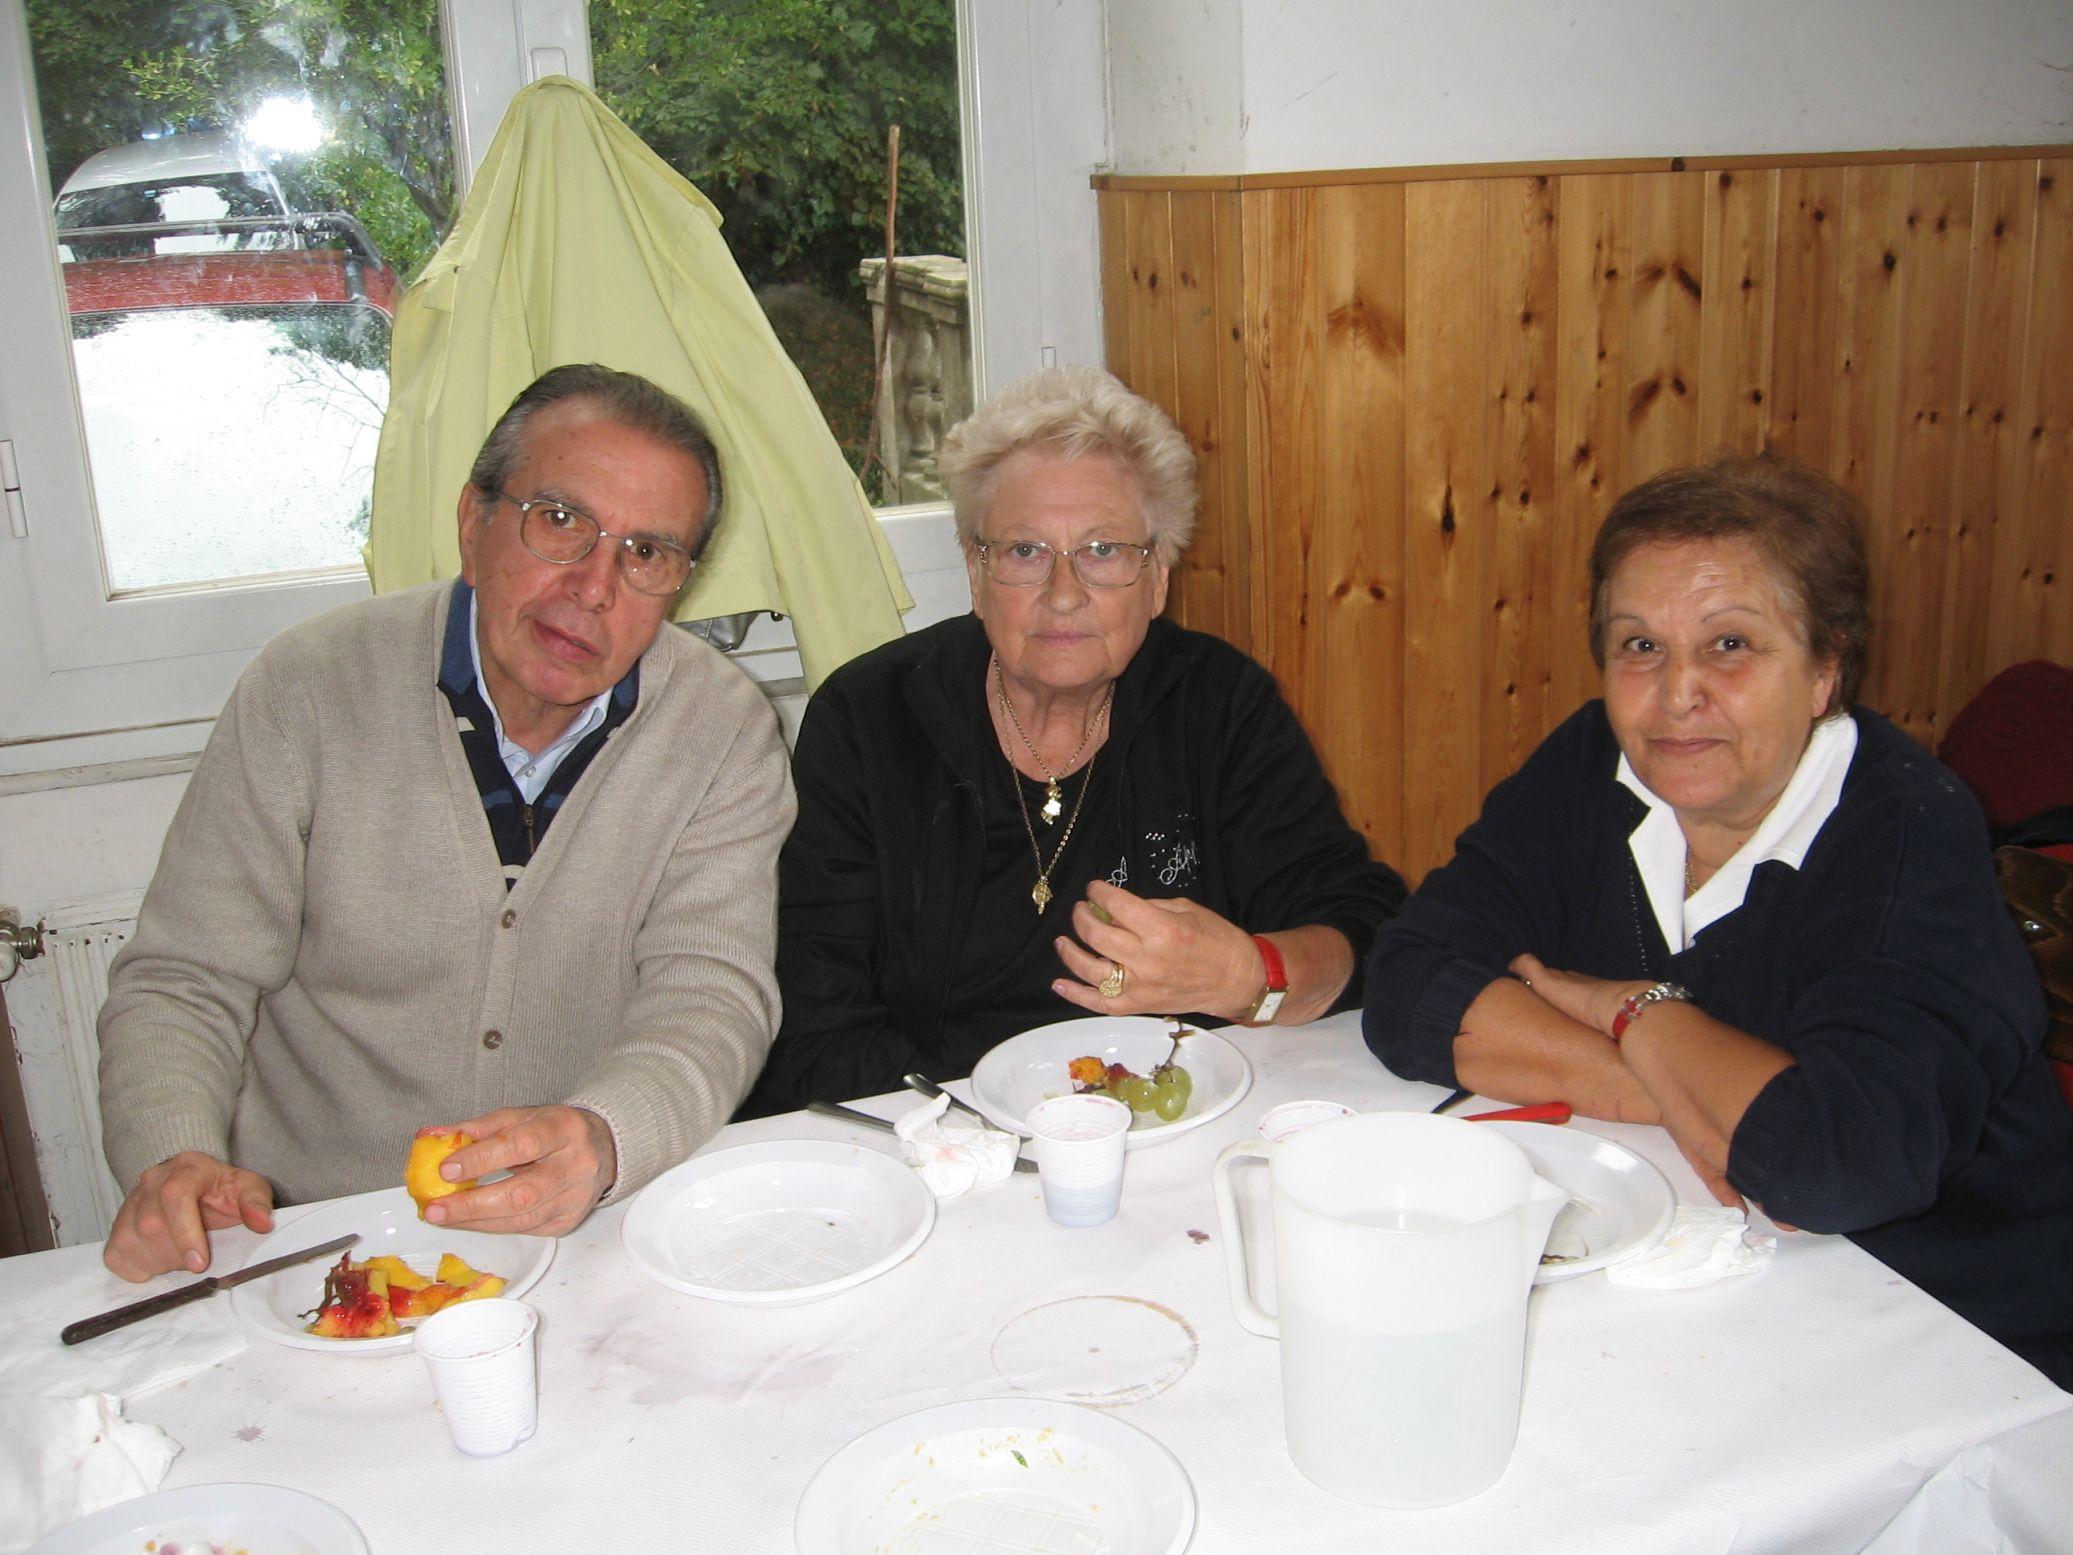 Bivacco_Persone_Impegnate_Torriglia-2009-09-20--14.13.31